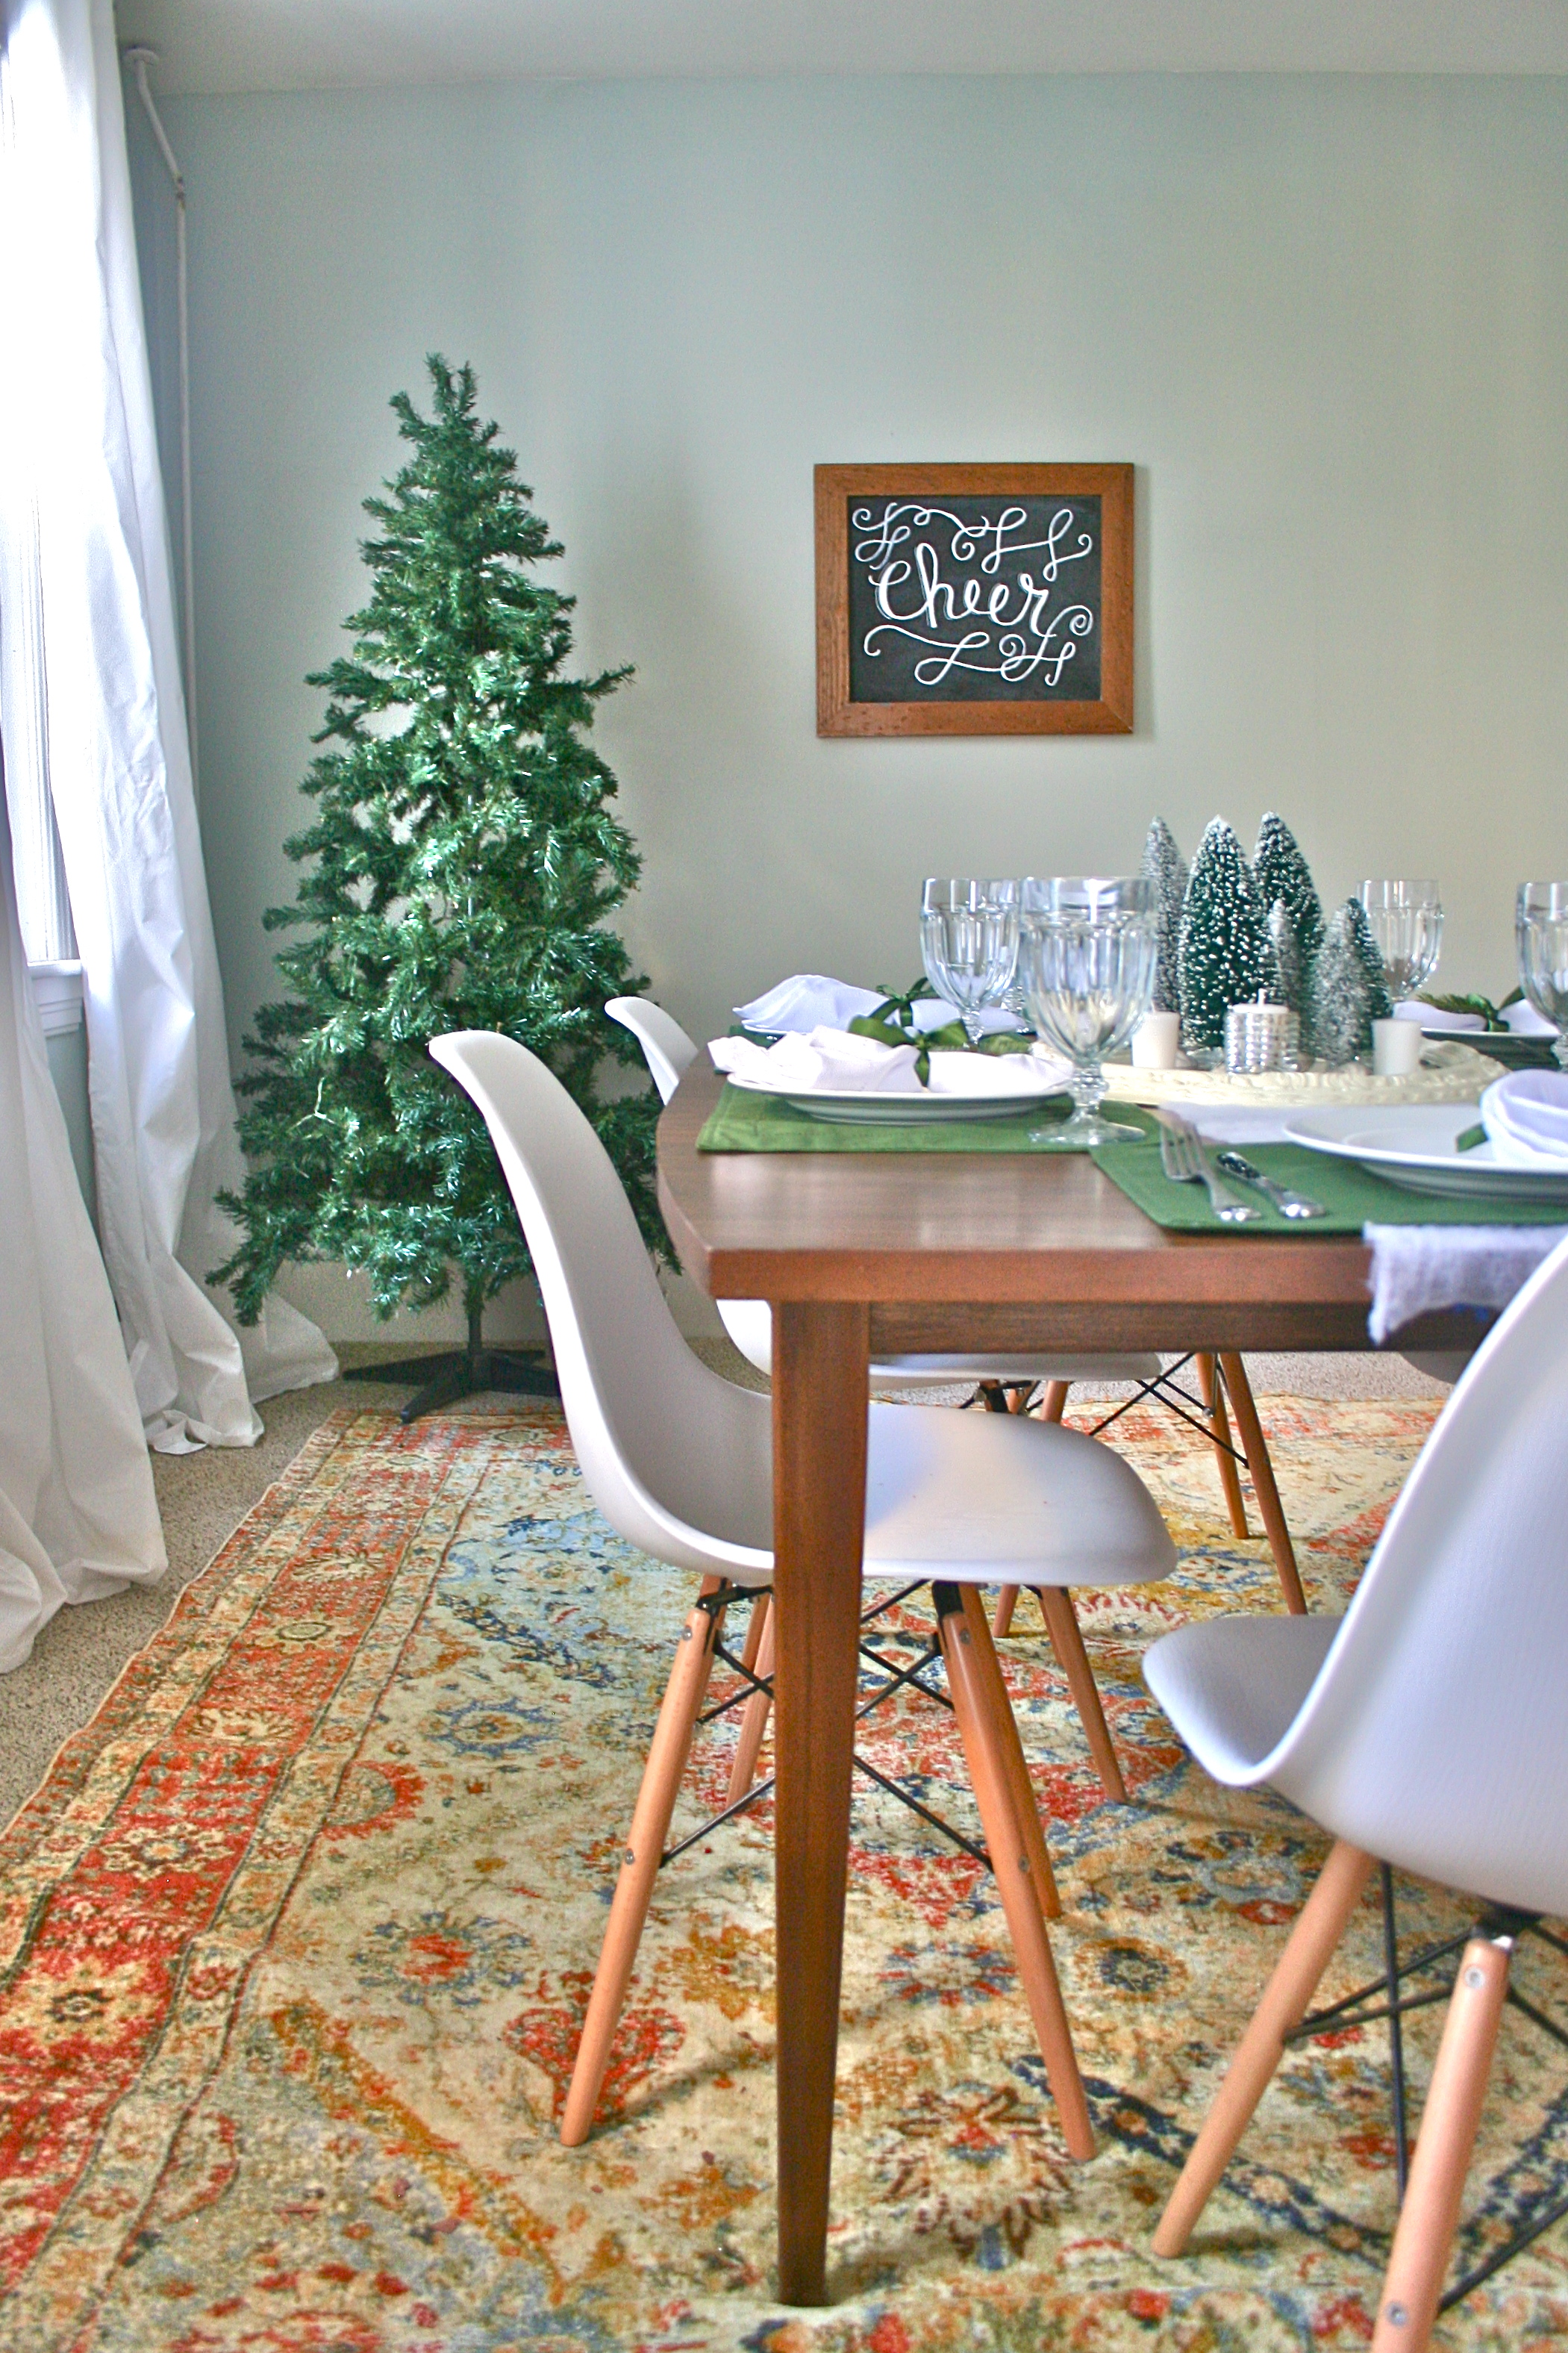 Holiday Home Tour 2015- Stevie Storck Design Co.